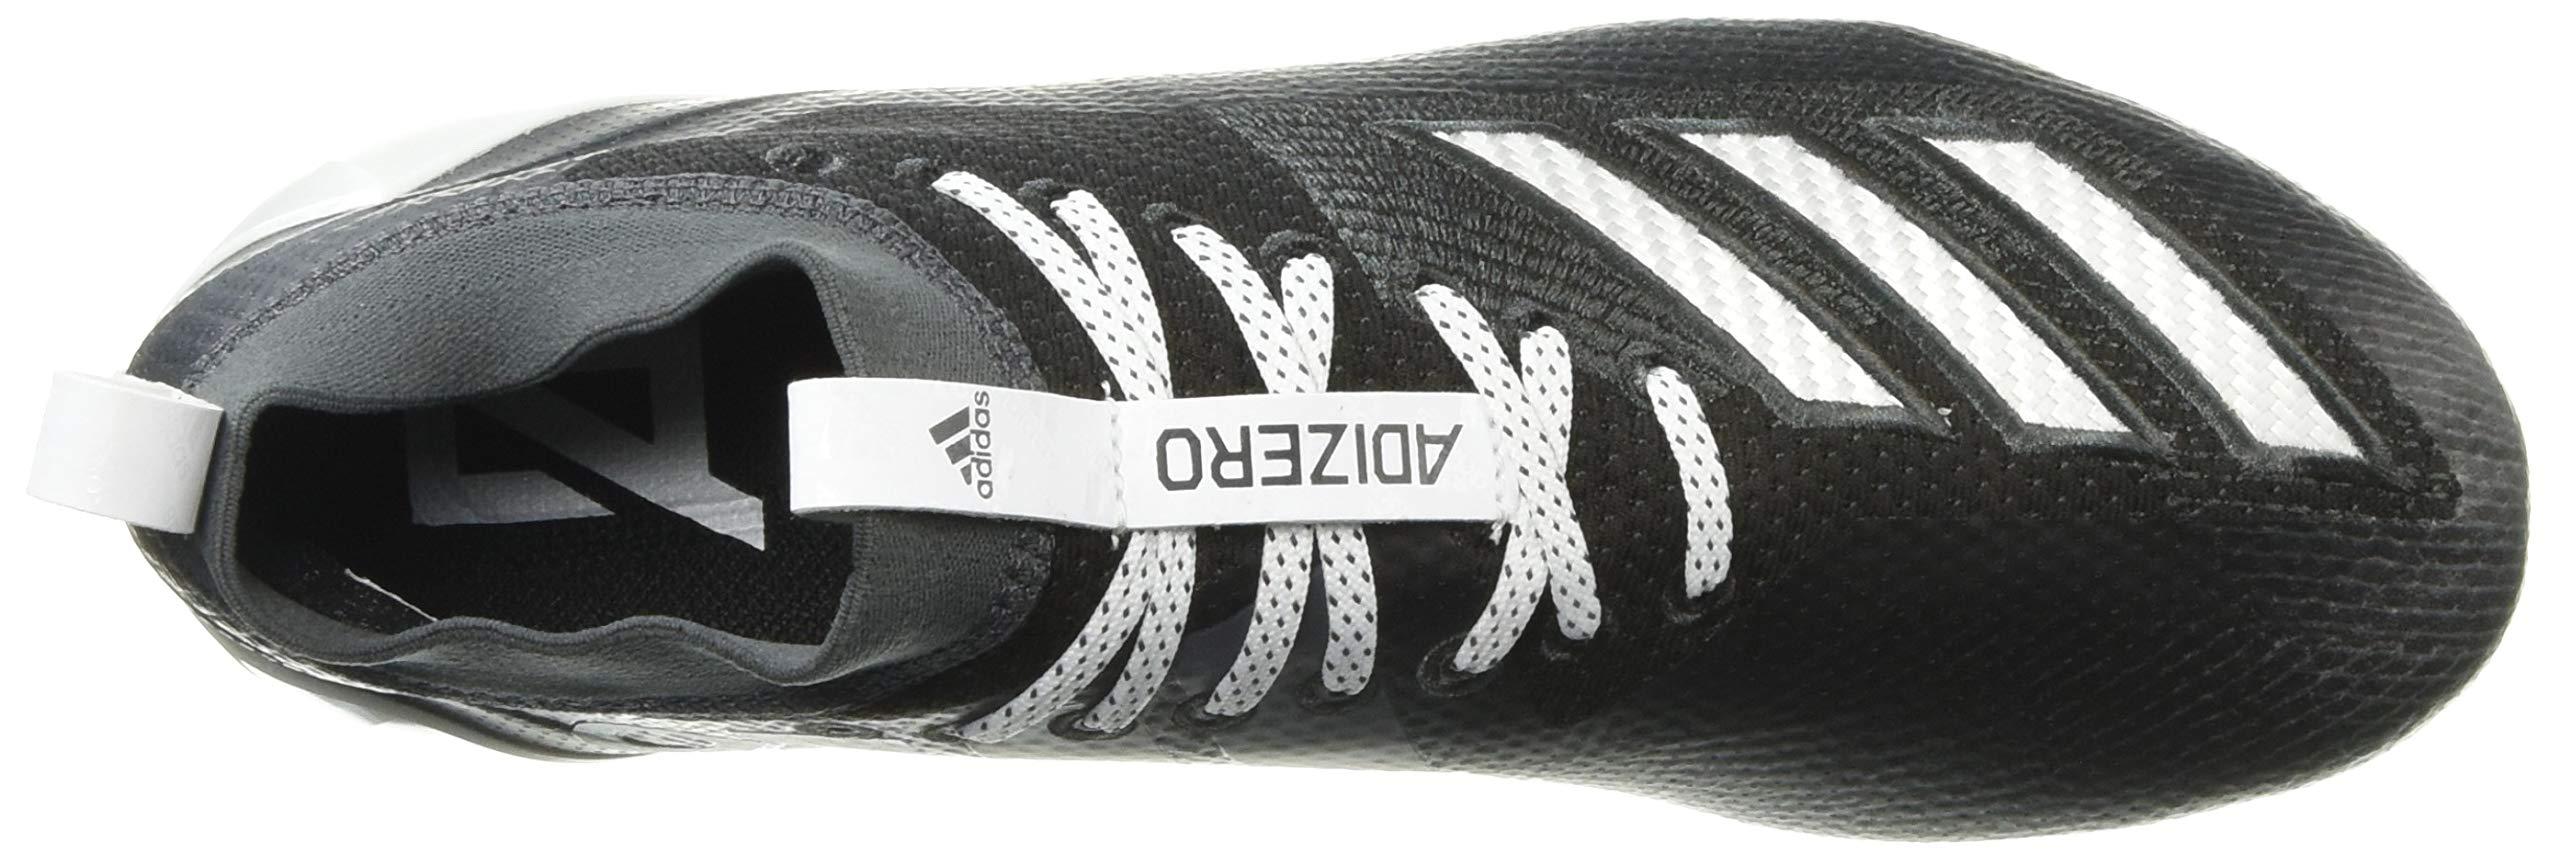 adidas Men's Adizero 8.0 Football Shoe Black/White/Grey 6.5 M US by adidas (Image #8)